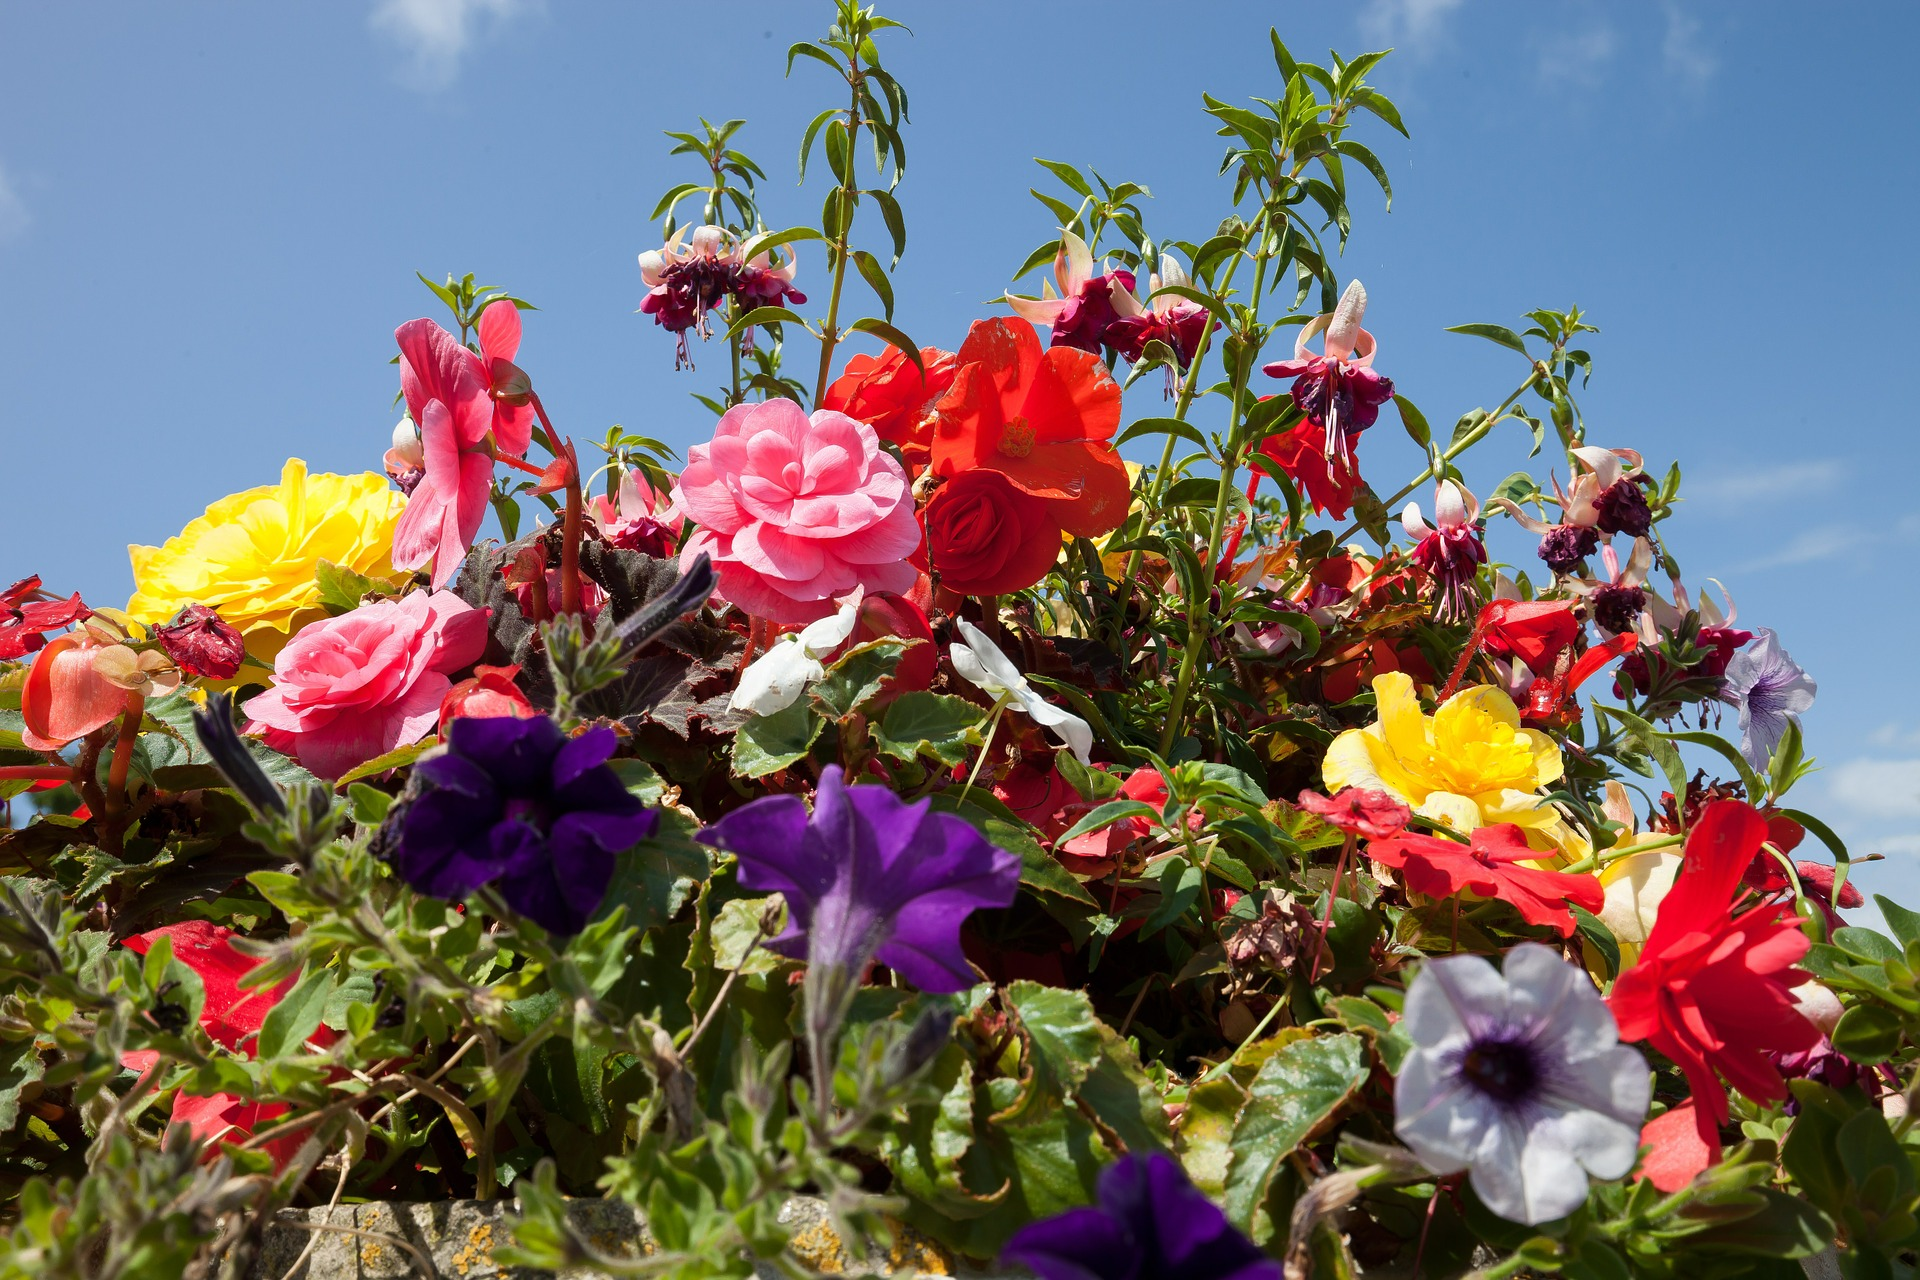 Flowers in the Garden, Blooming, Flower, Fragrance, Fresh, HQ Photo